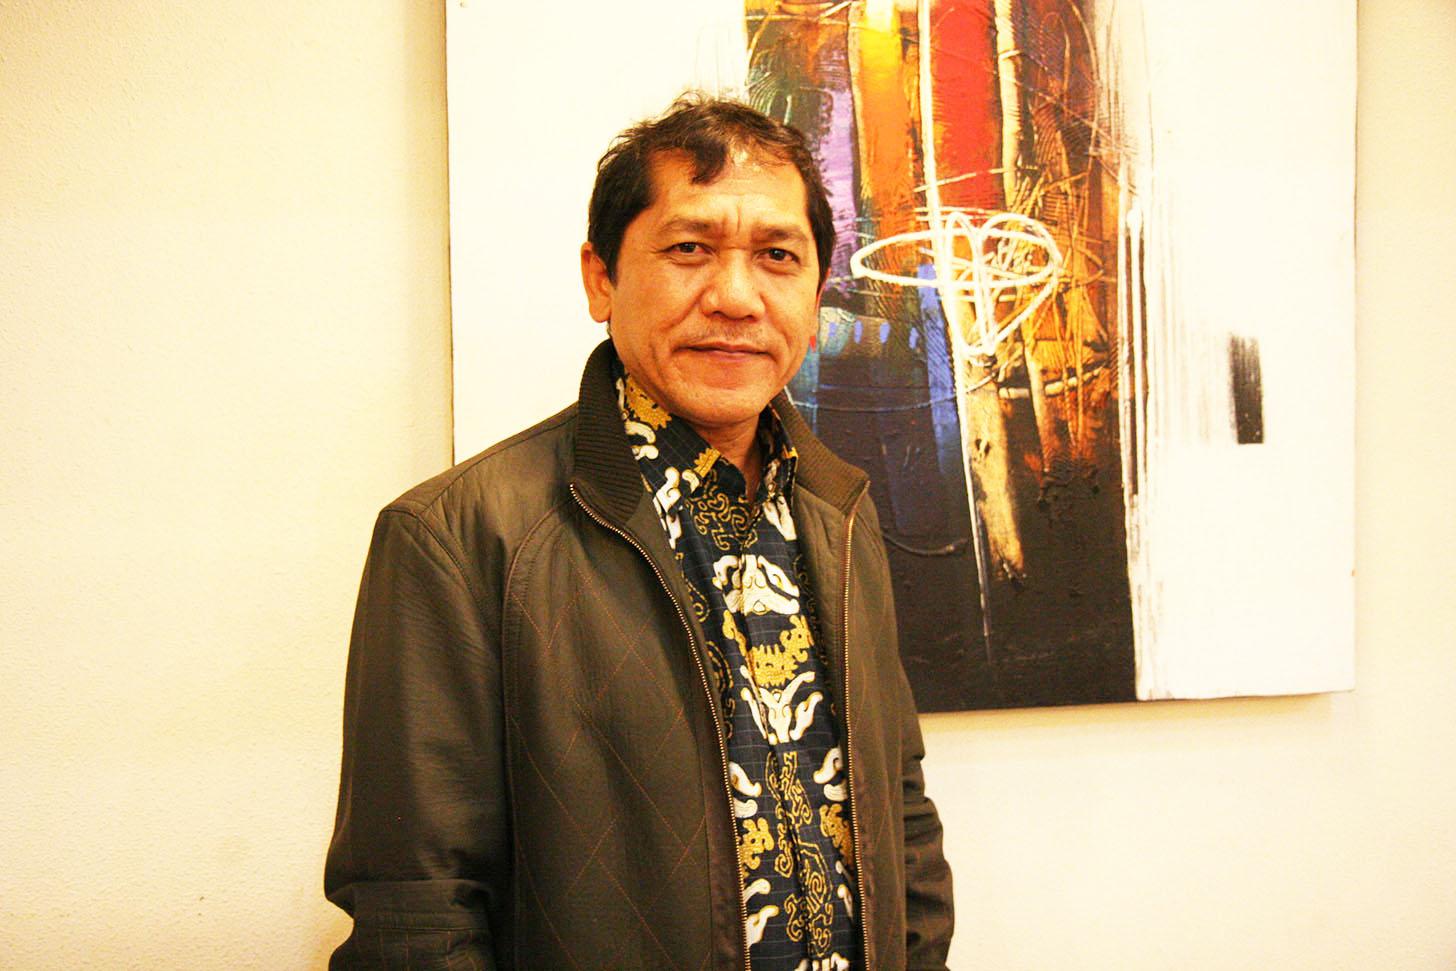 Head of Karo Regency Mr. Terkelin Brahmana